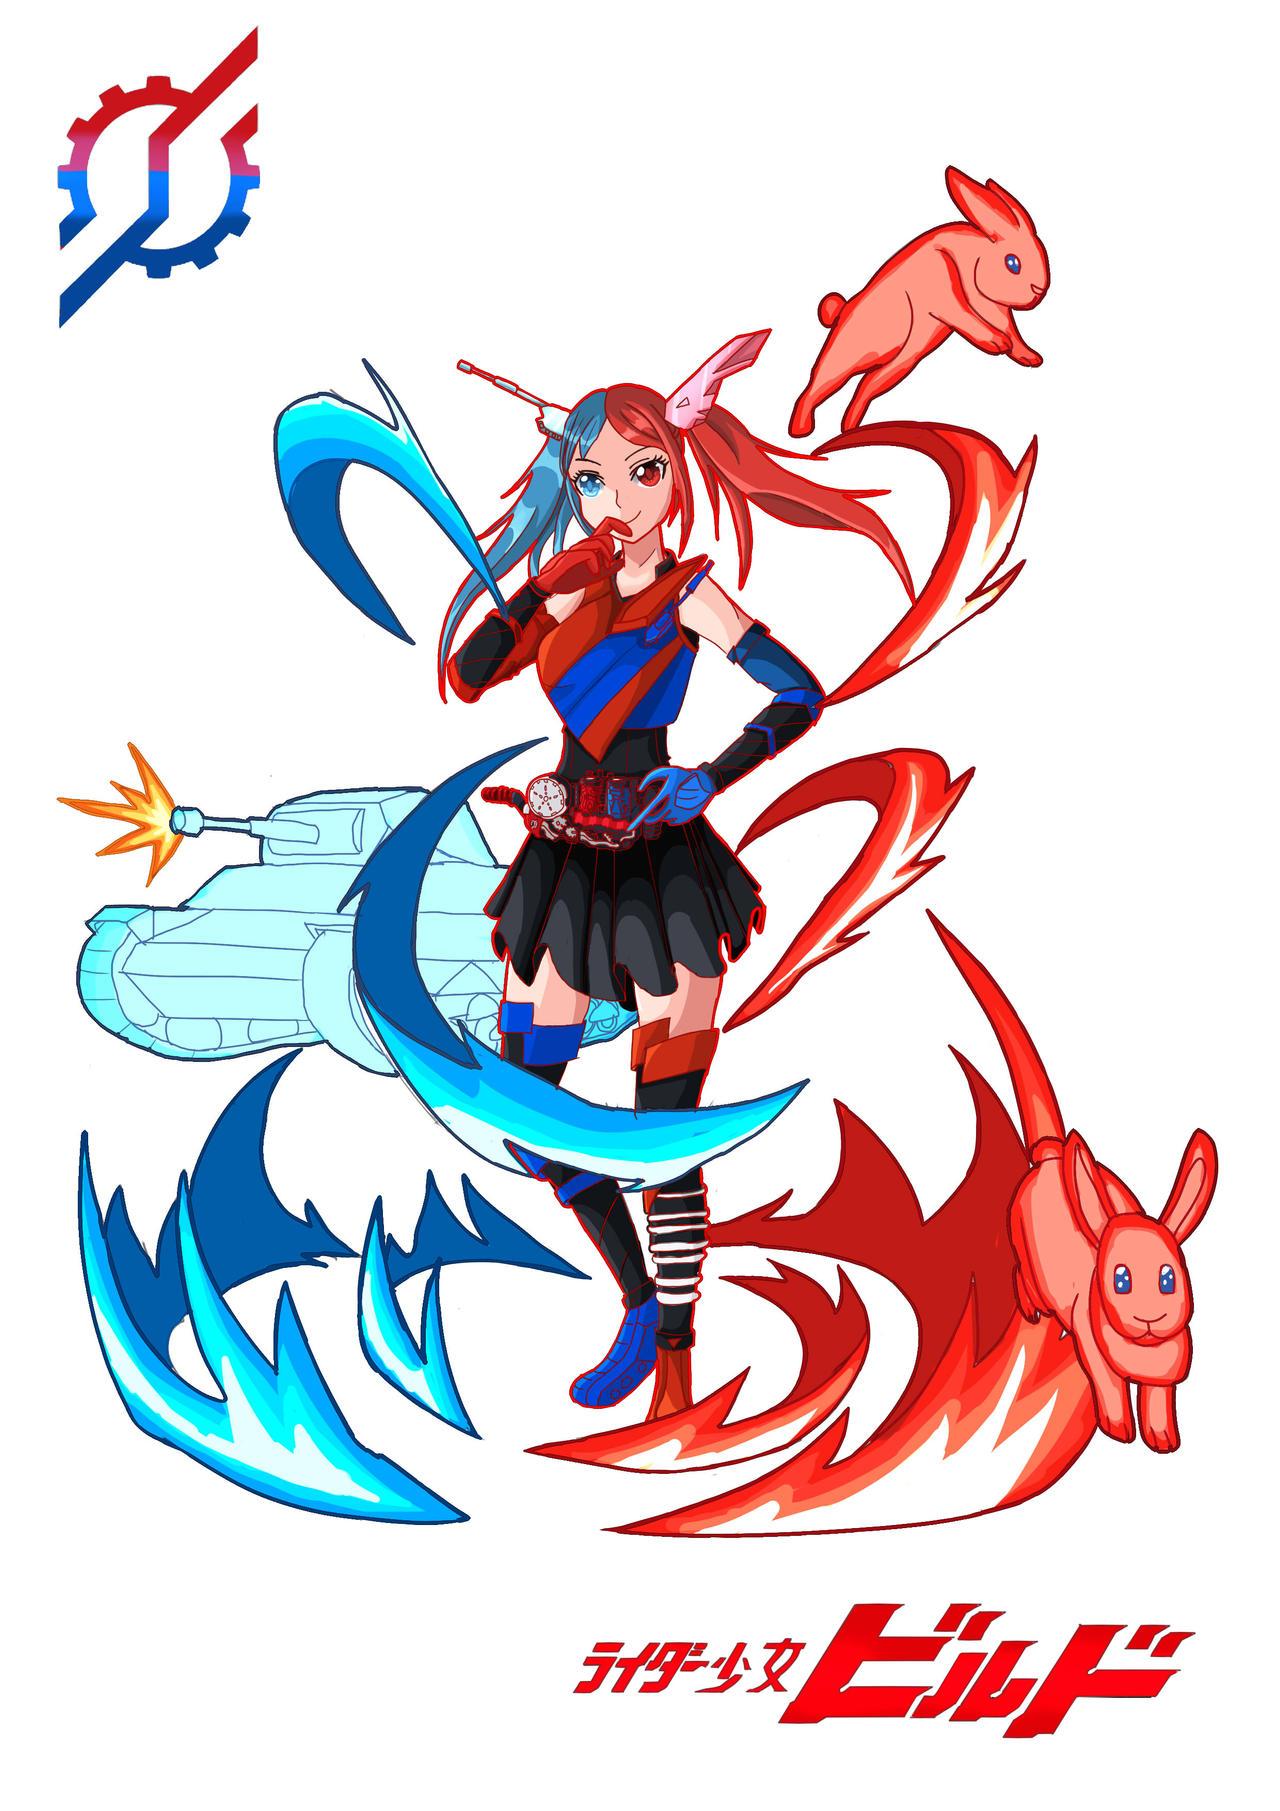 19 Rider Girl Build Character Art By Gatekeeper13100 On Deviantart